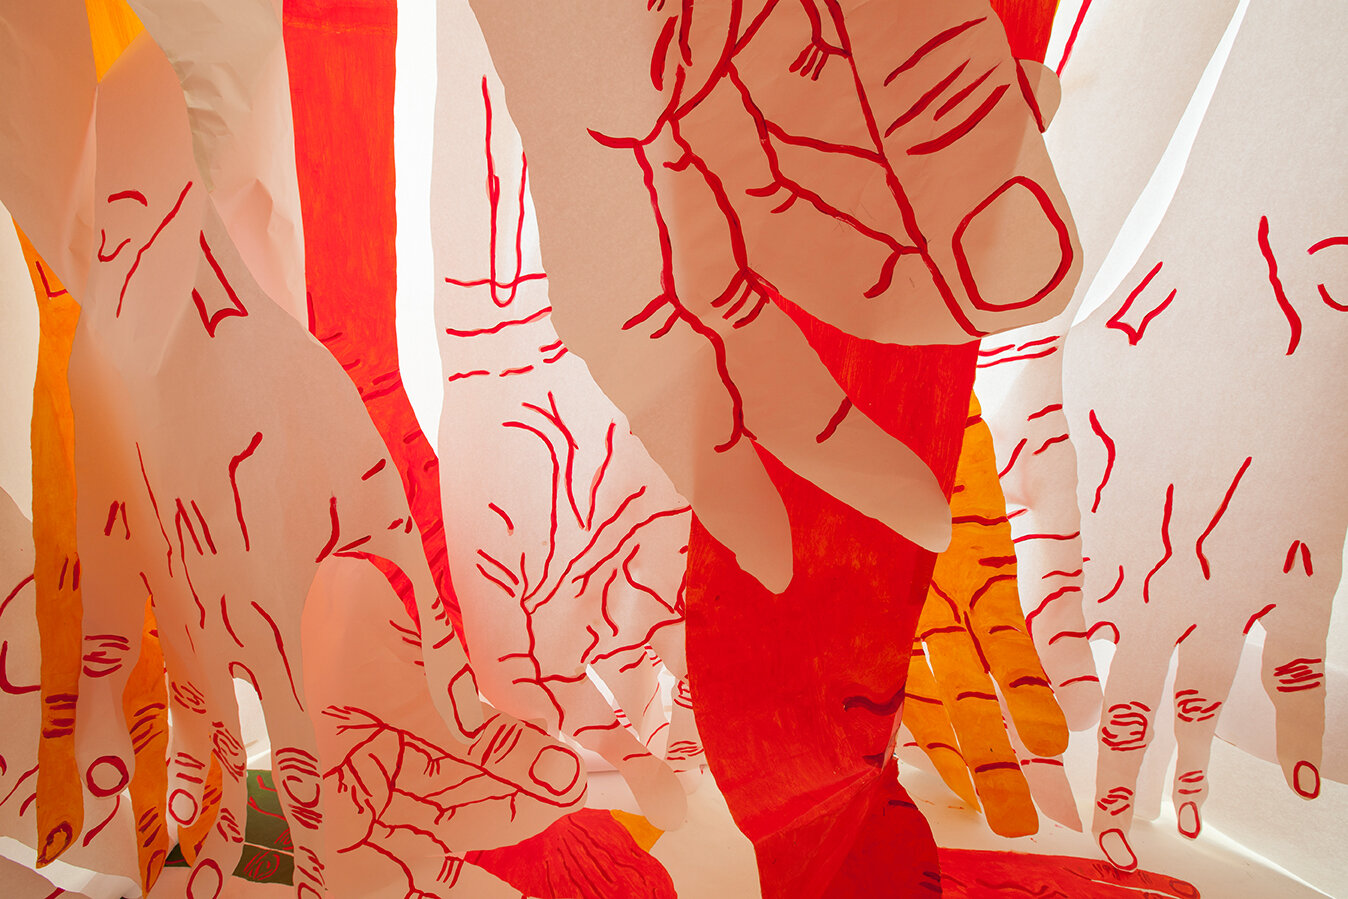 mirena-rhee-hands-tesseract-installation.jpg